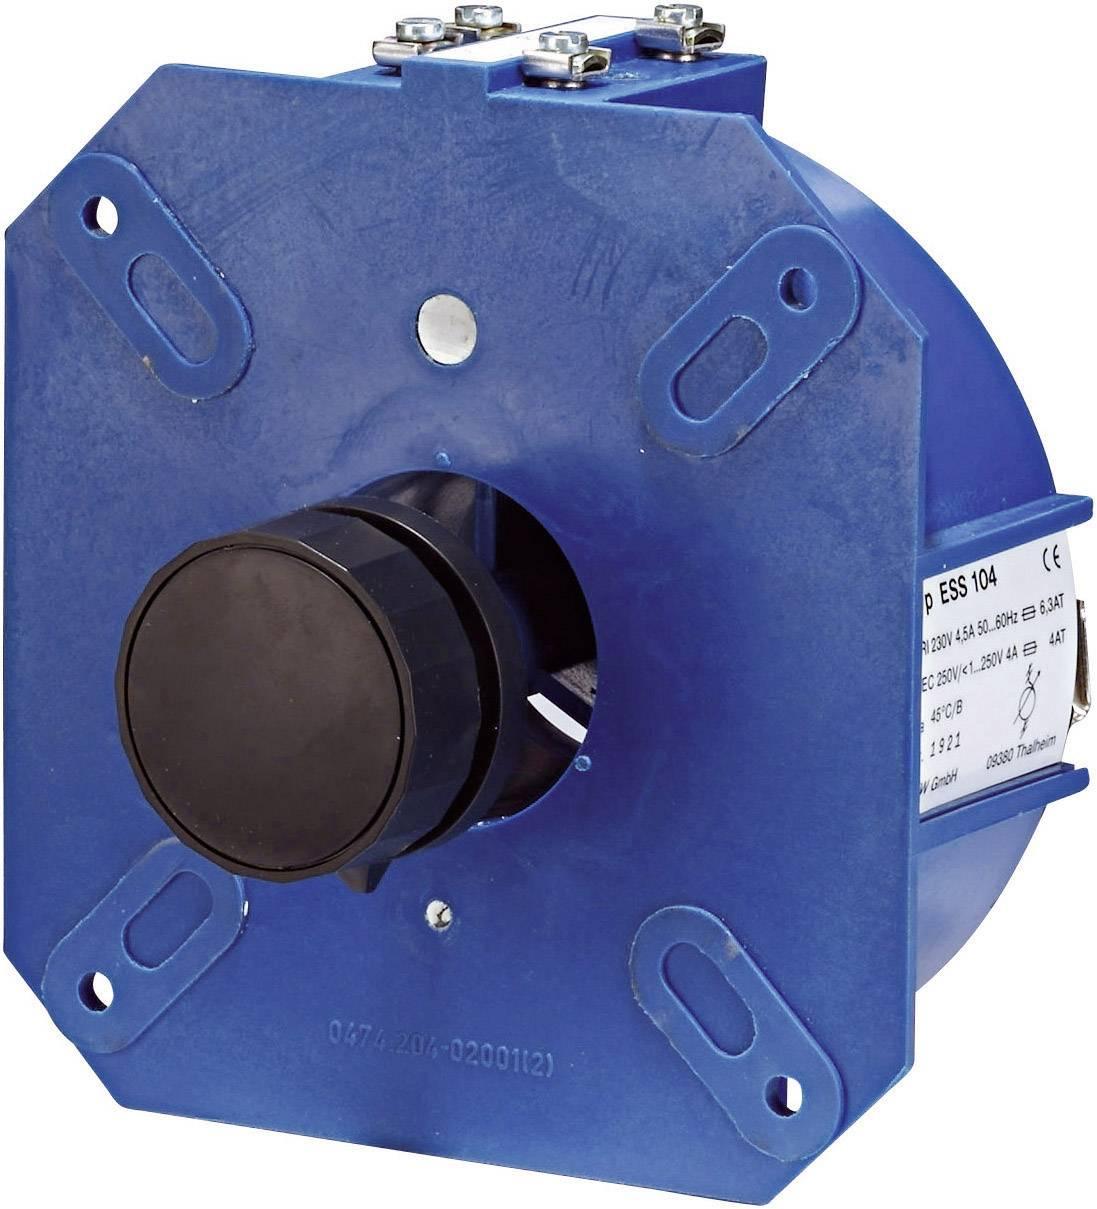 Regulační transformátor Thalheimer ESS 110, 230 V~, 1 - 250 V, 10 A